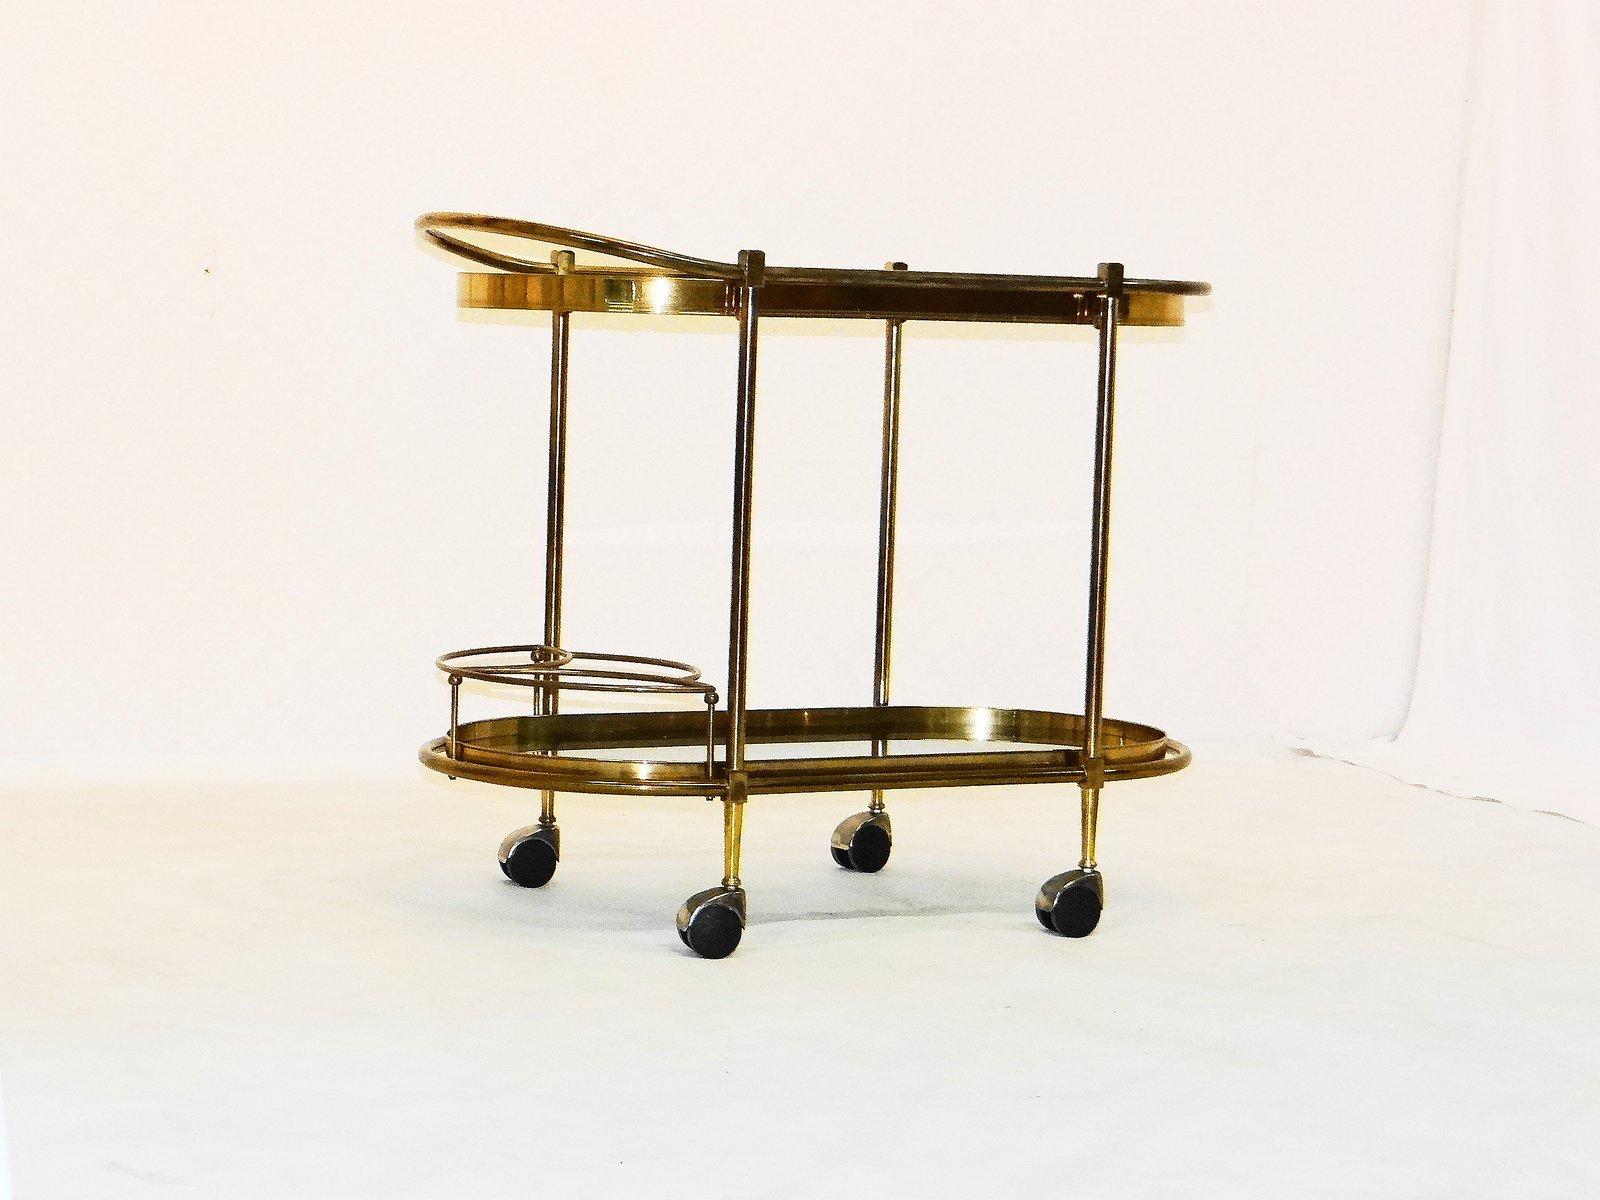 chariot de service vintage en laiton france en vente sur pamono. Black Bedroom Furniture Sets. Home Design Ideas